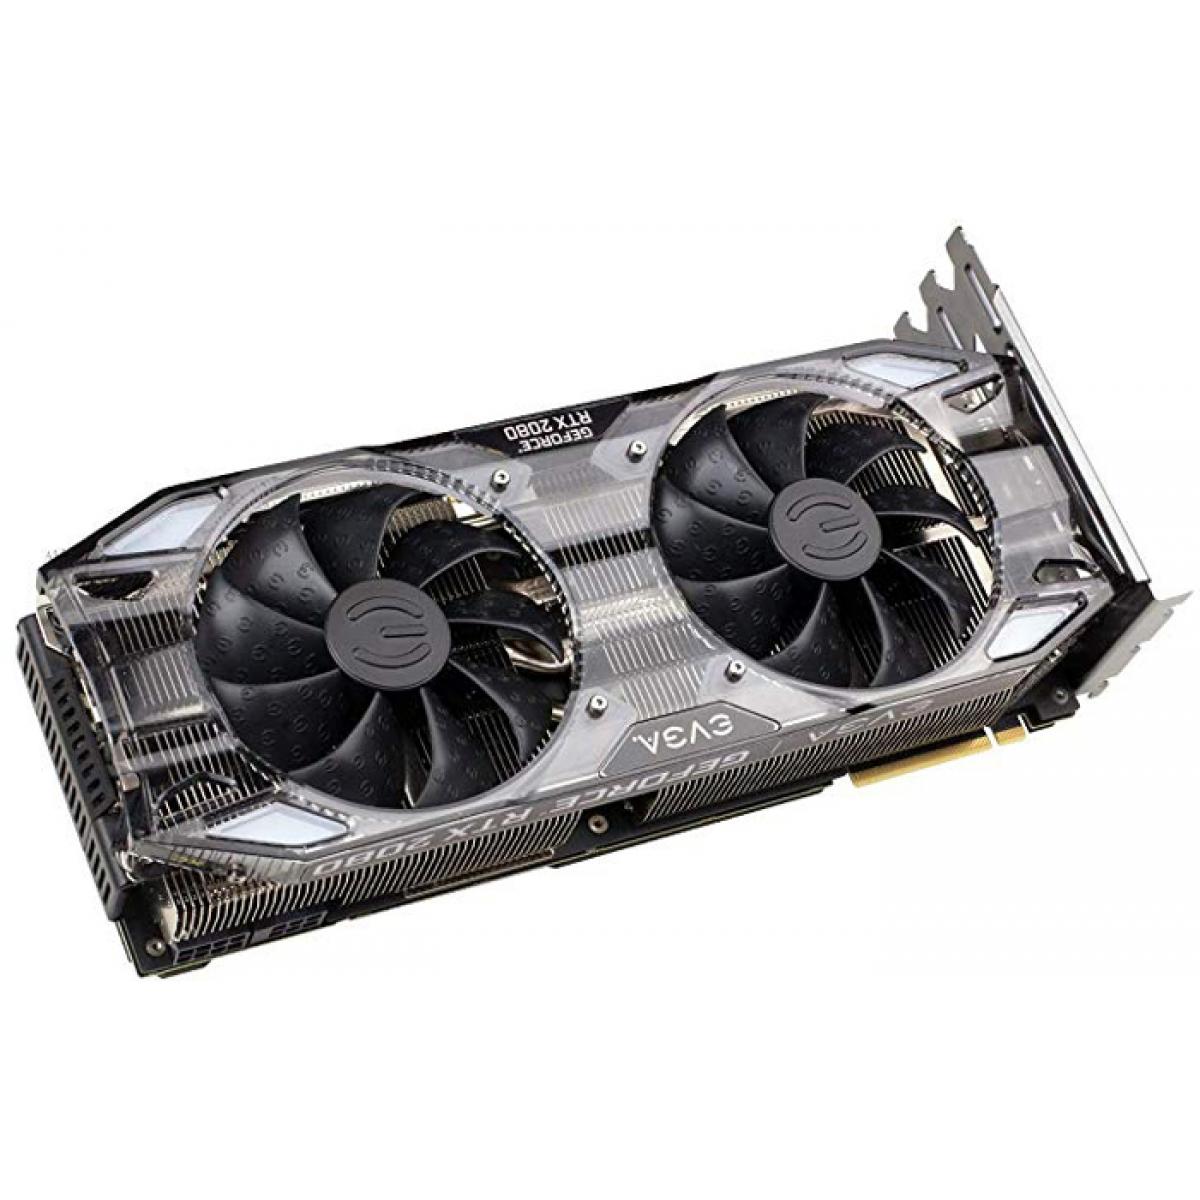 Placa de Vídeo EVGA Geforce RTX 2080 XC Ultra Gaming Dual, 8GB GDDR6, 256Bit, 08G-P4-2183-KR